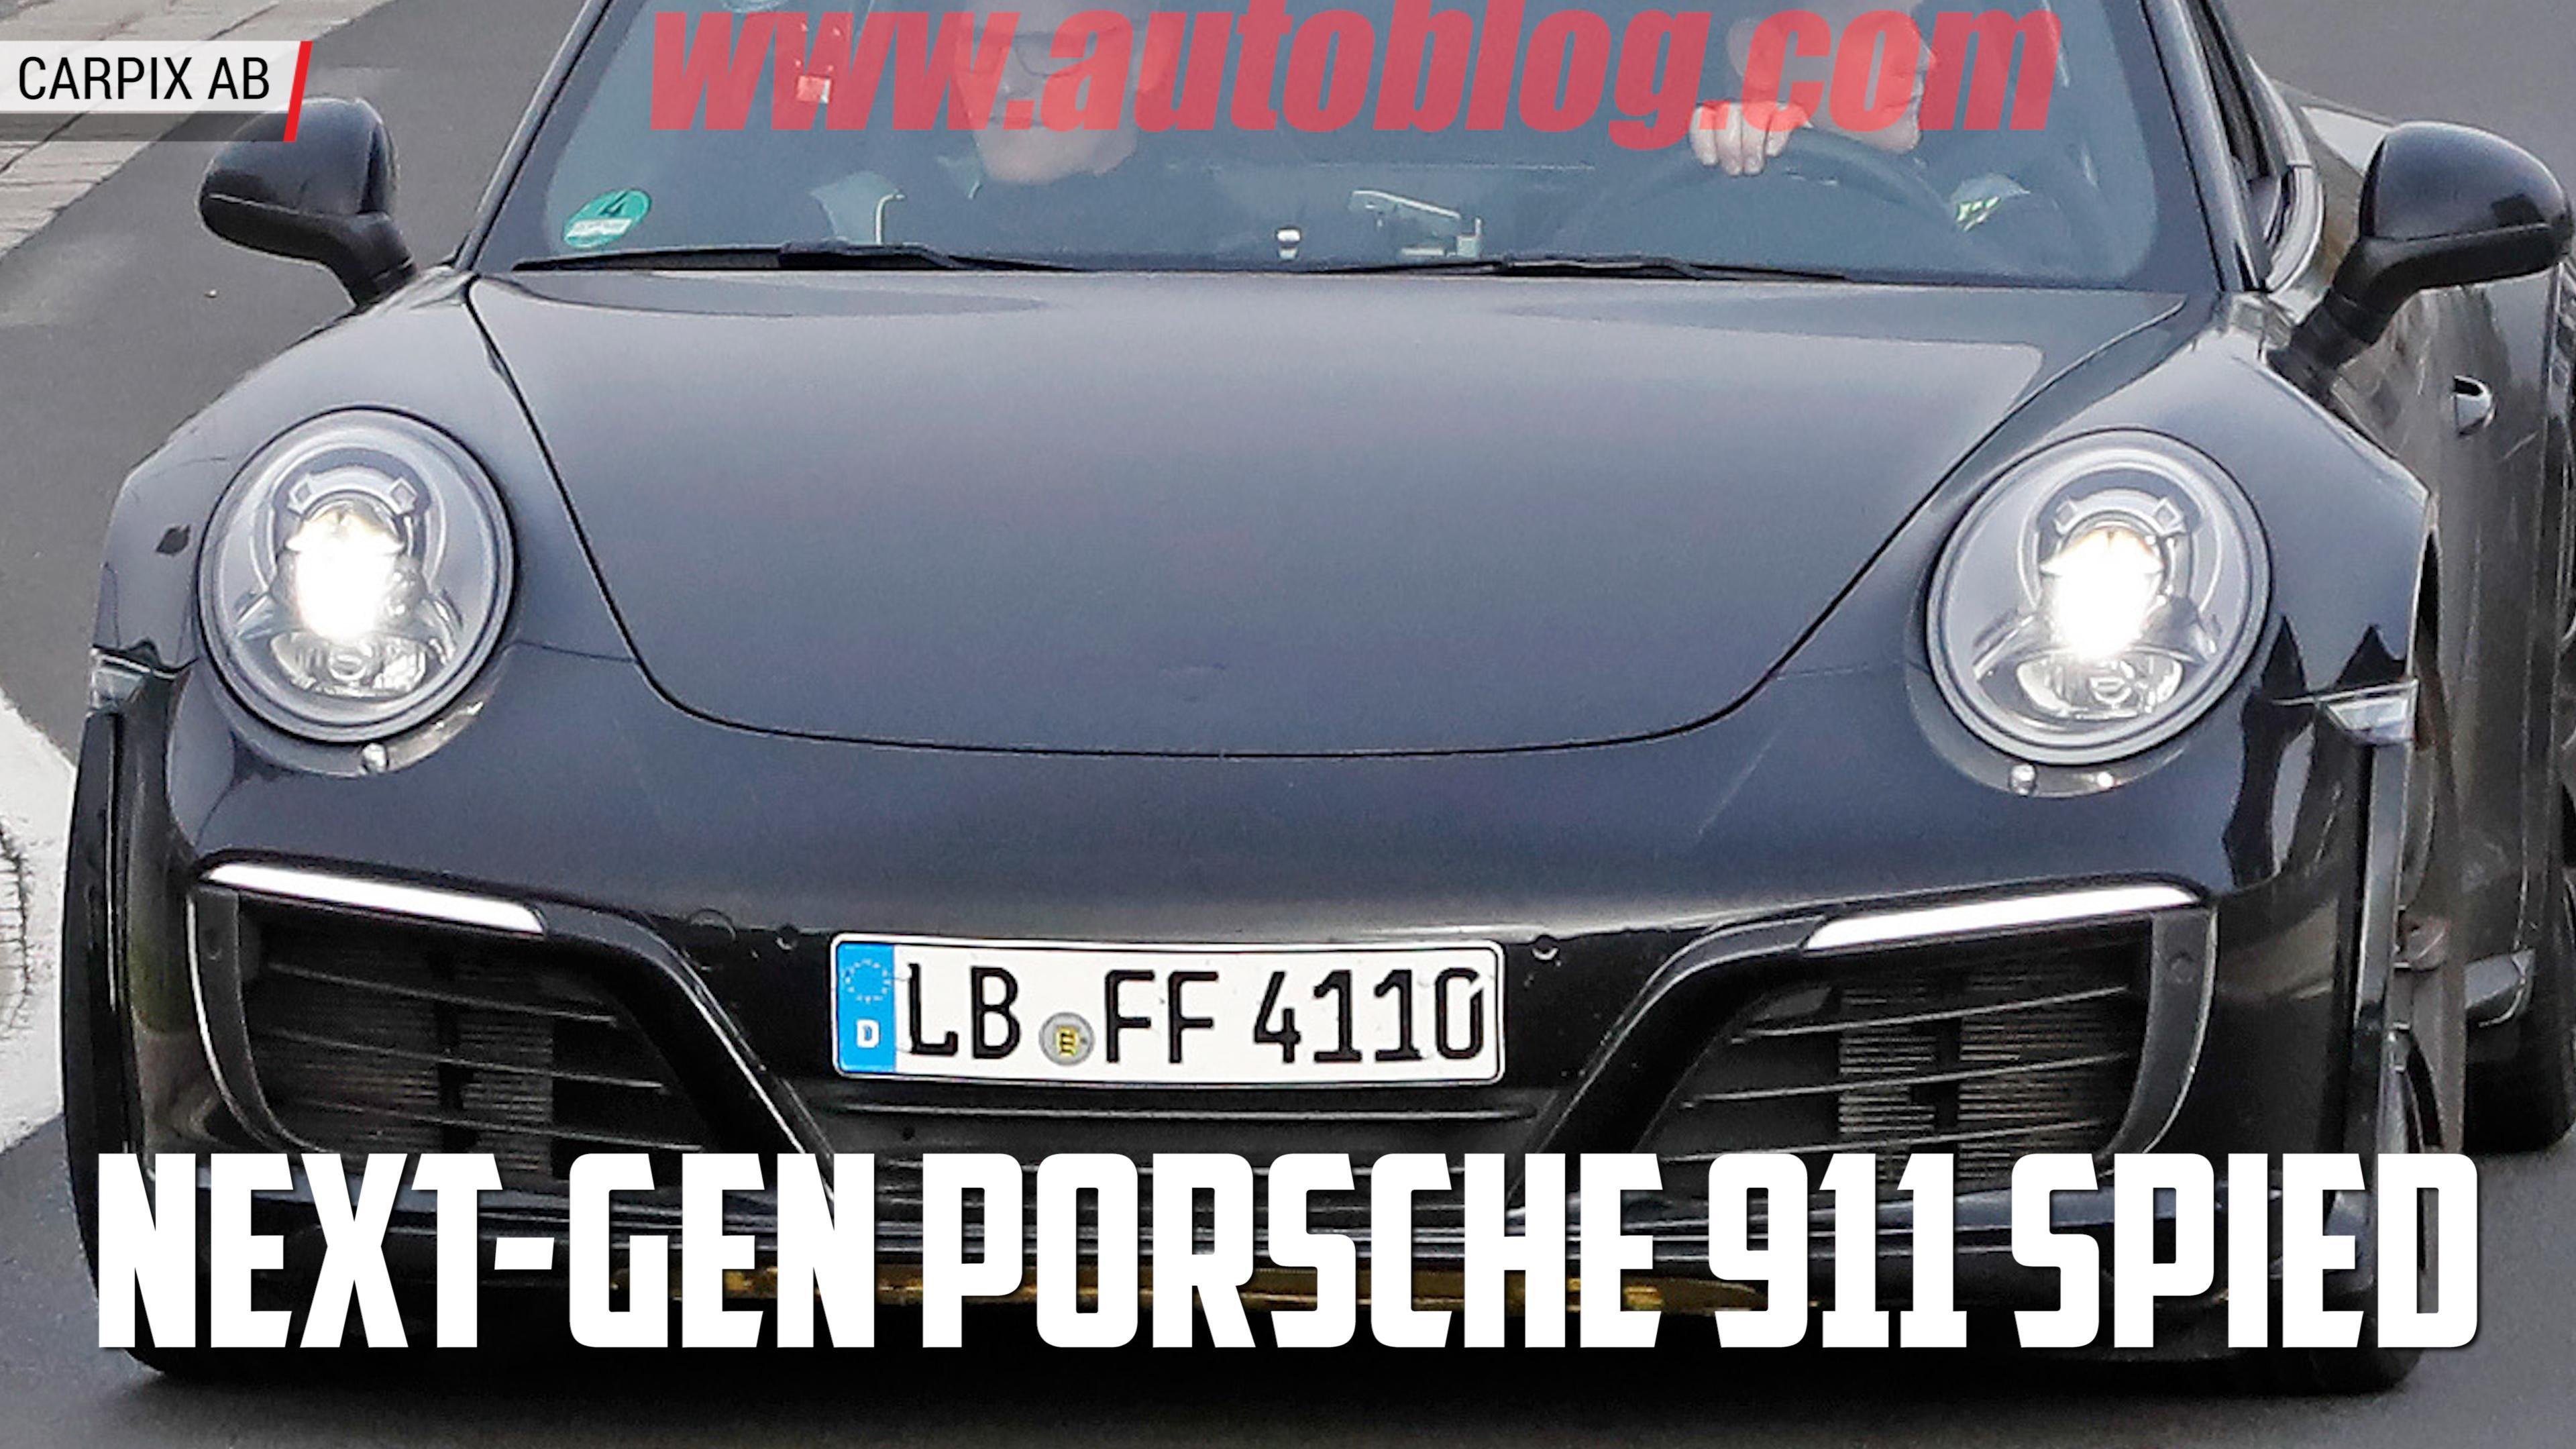 porsche 911 gt2 rs gets water injection makes more than 641 horsepower autoblog. Black Bedroom Furniture Sets. Home Design Ideas